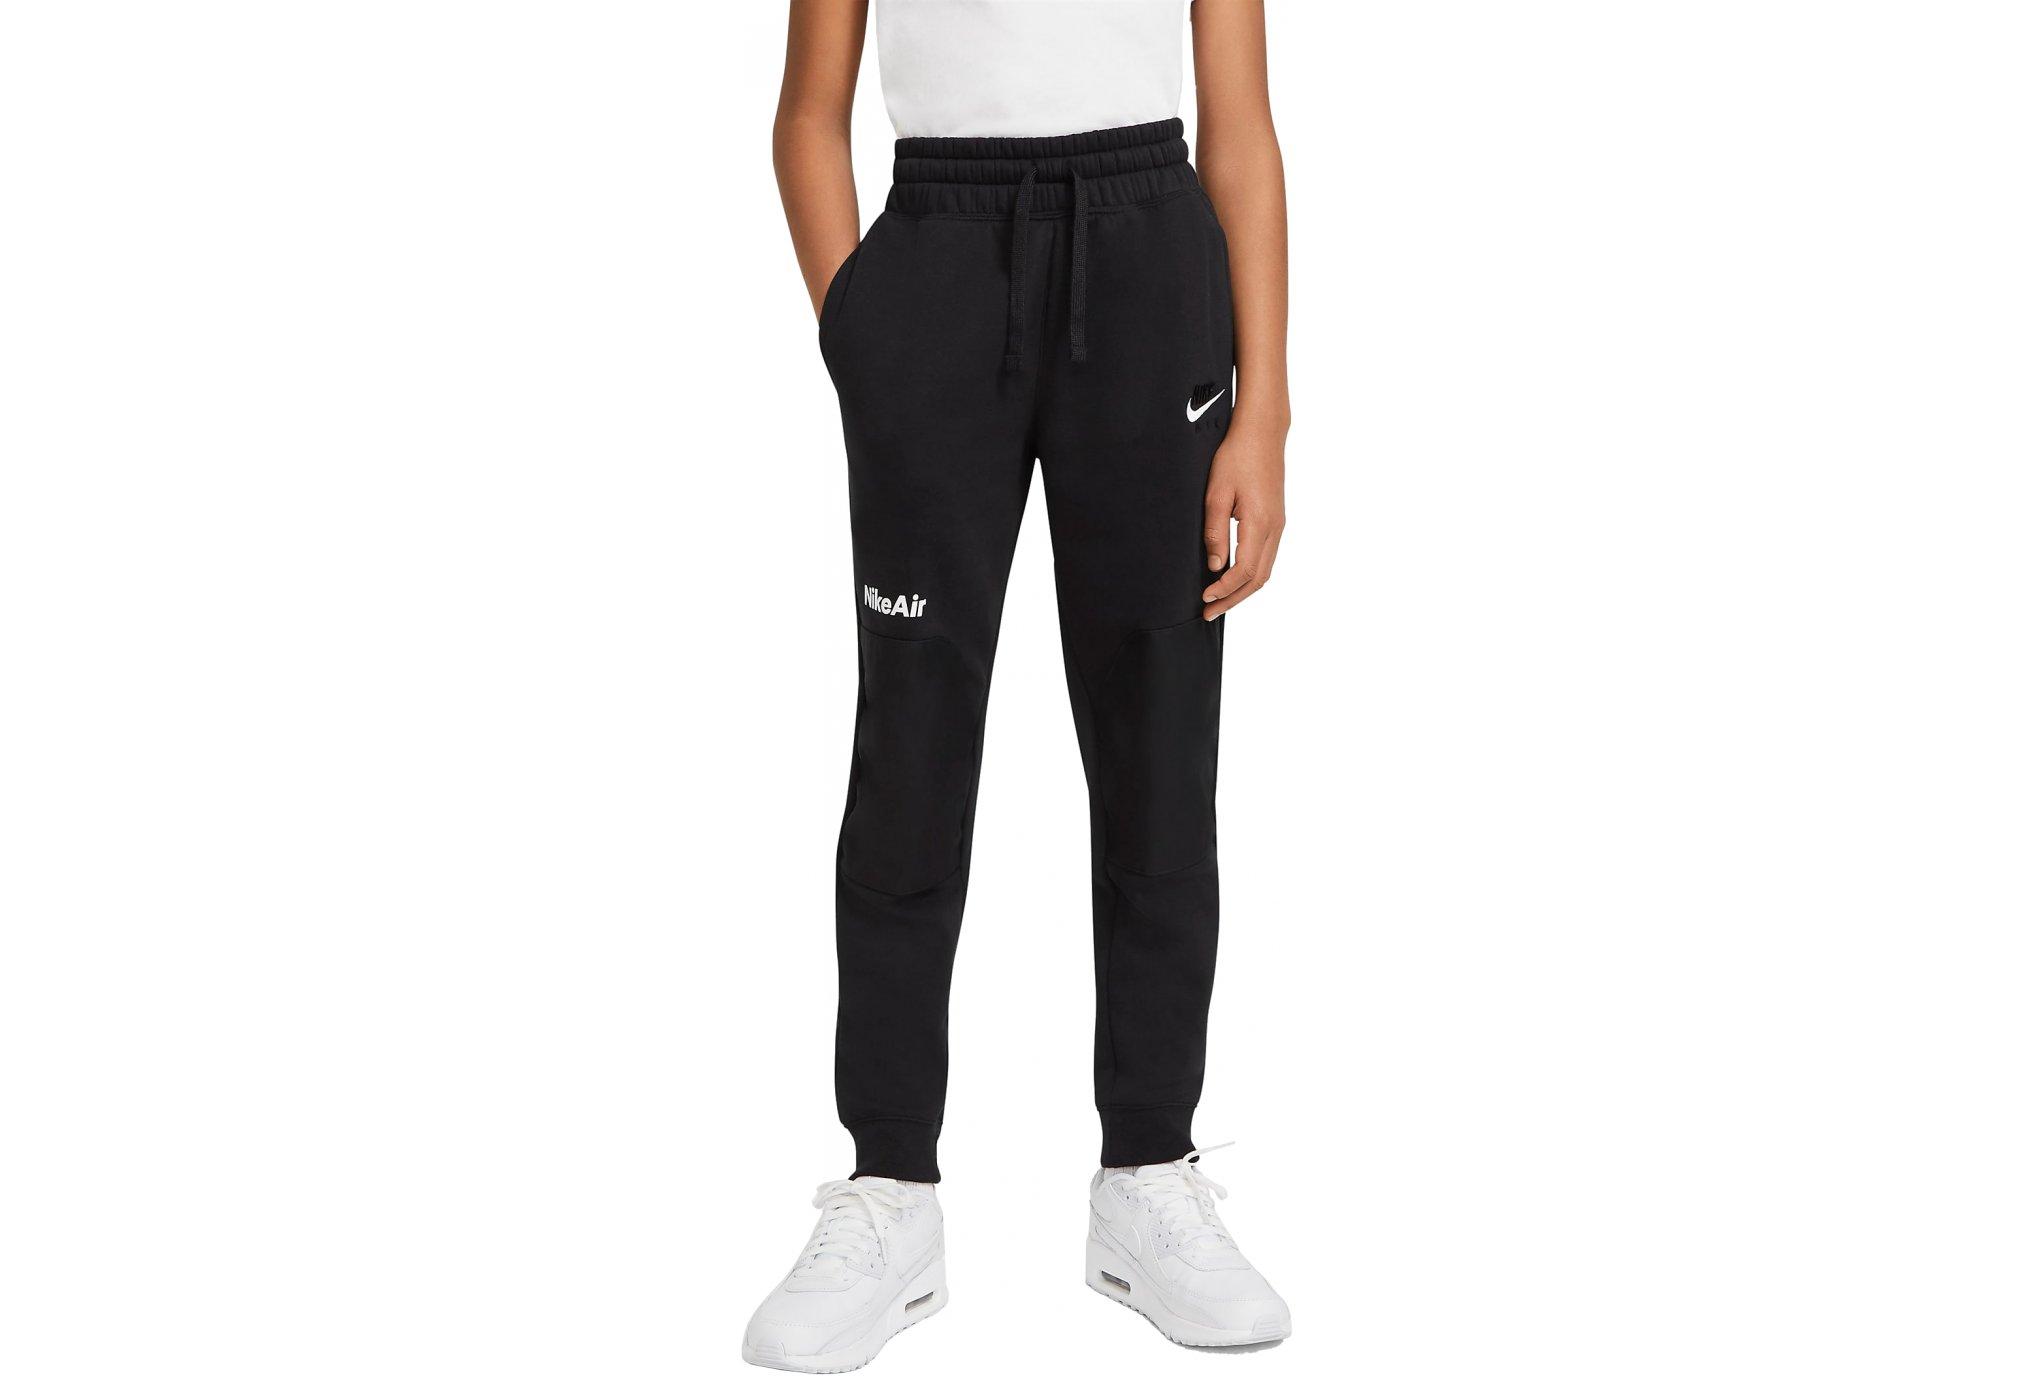 Nike Air Junior vêtement running homme